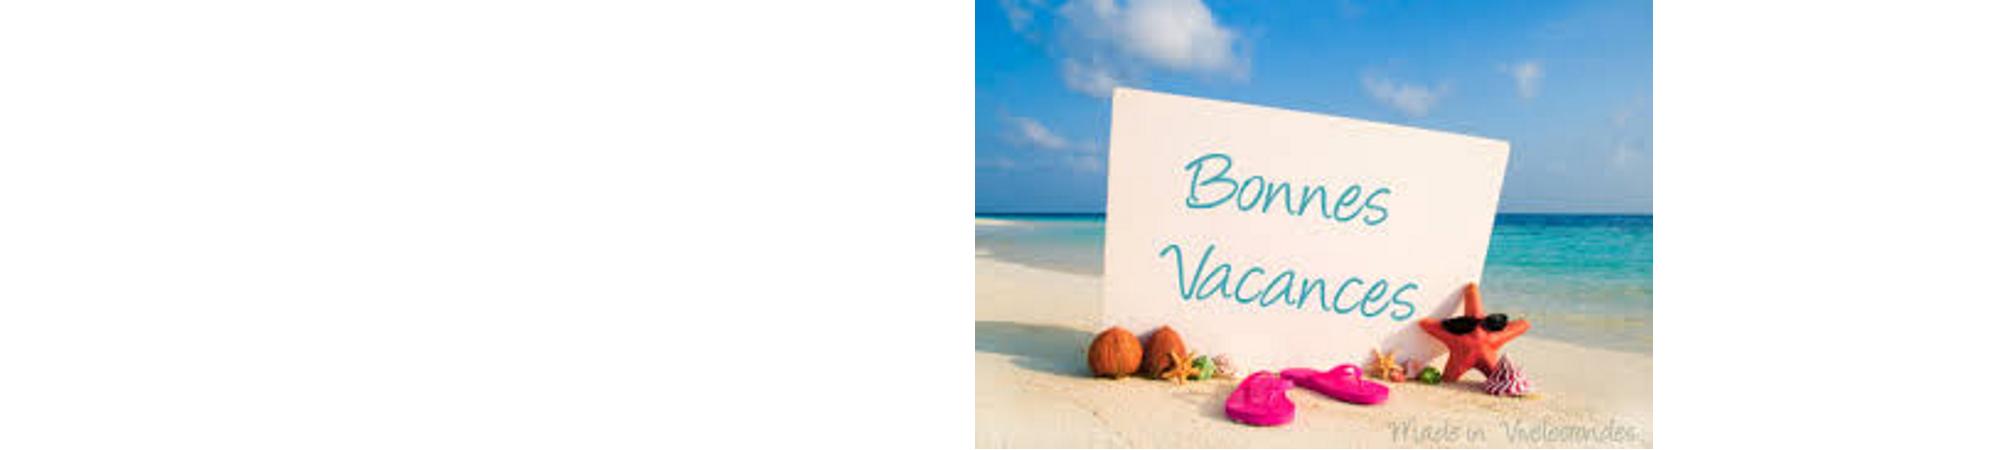 vacance-mapiece-2